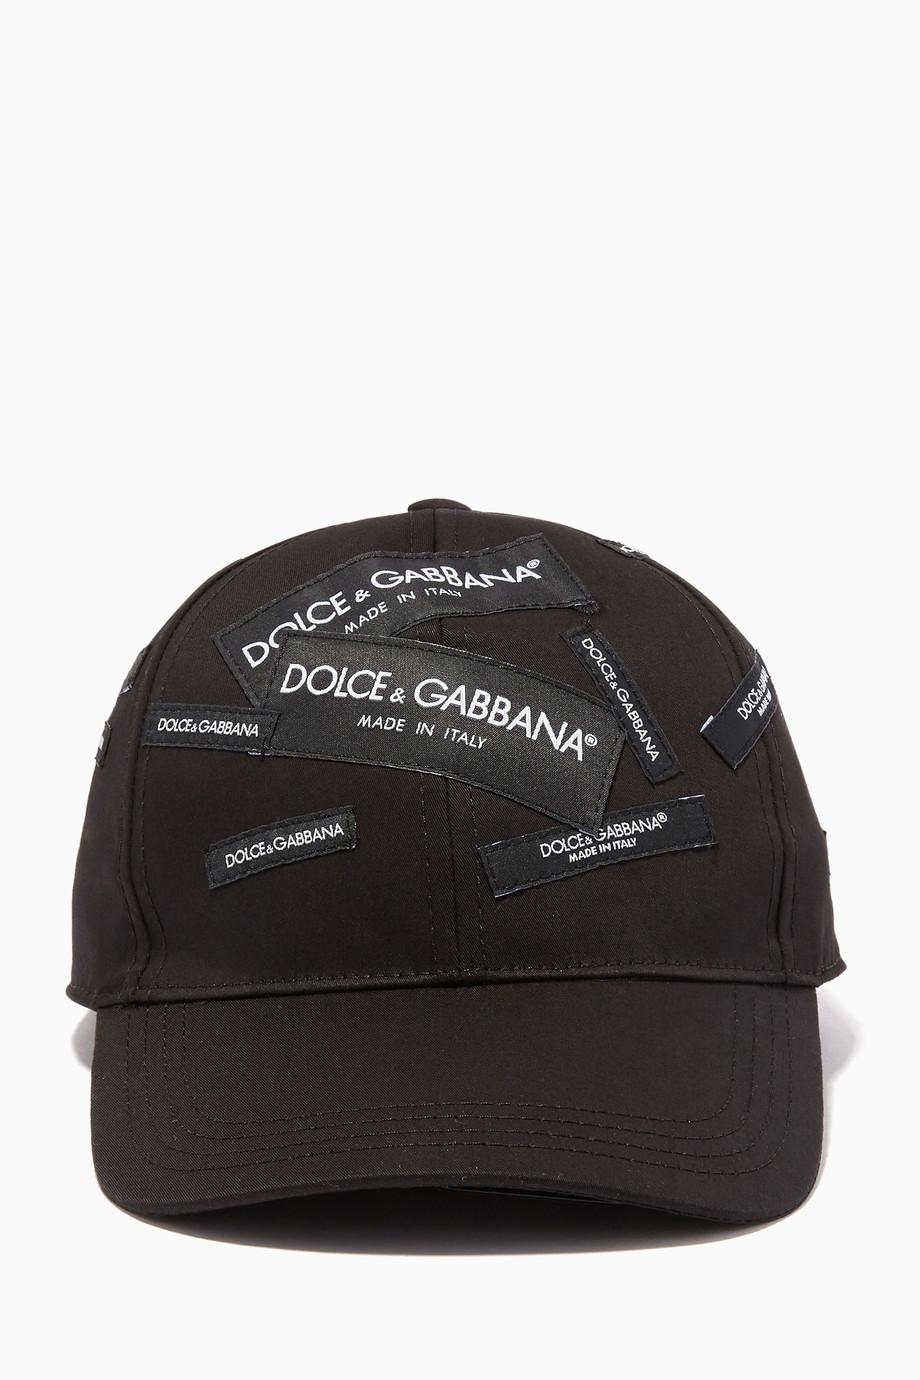 78d4a236a Shop Dolce & Gabbana Black Black Embroidered Labels Cap for Men ...